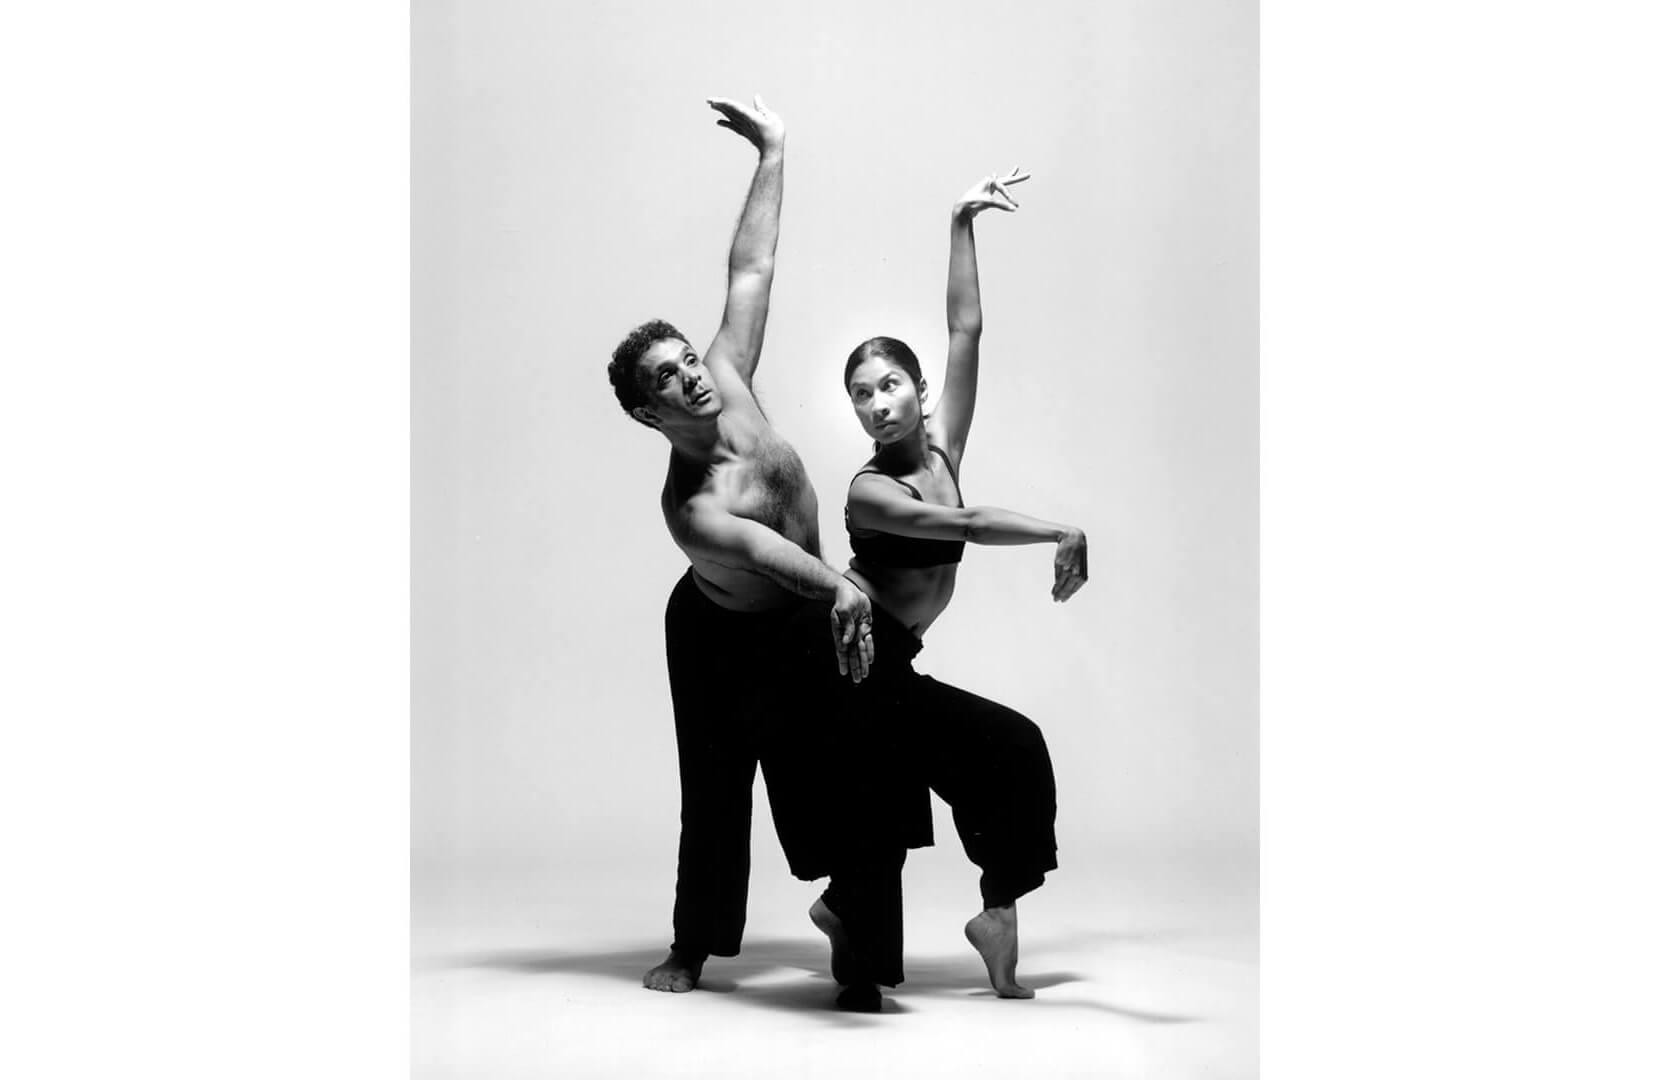 Sinha Danse 1999, Loha, Roger Sinha, Natasha Bakht. Image credit: M. Slobodian